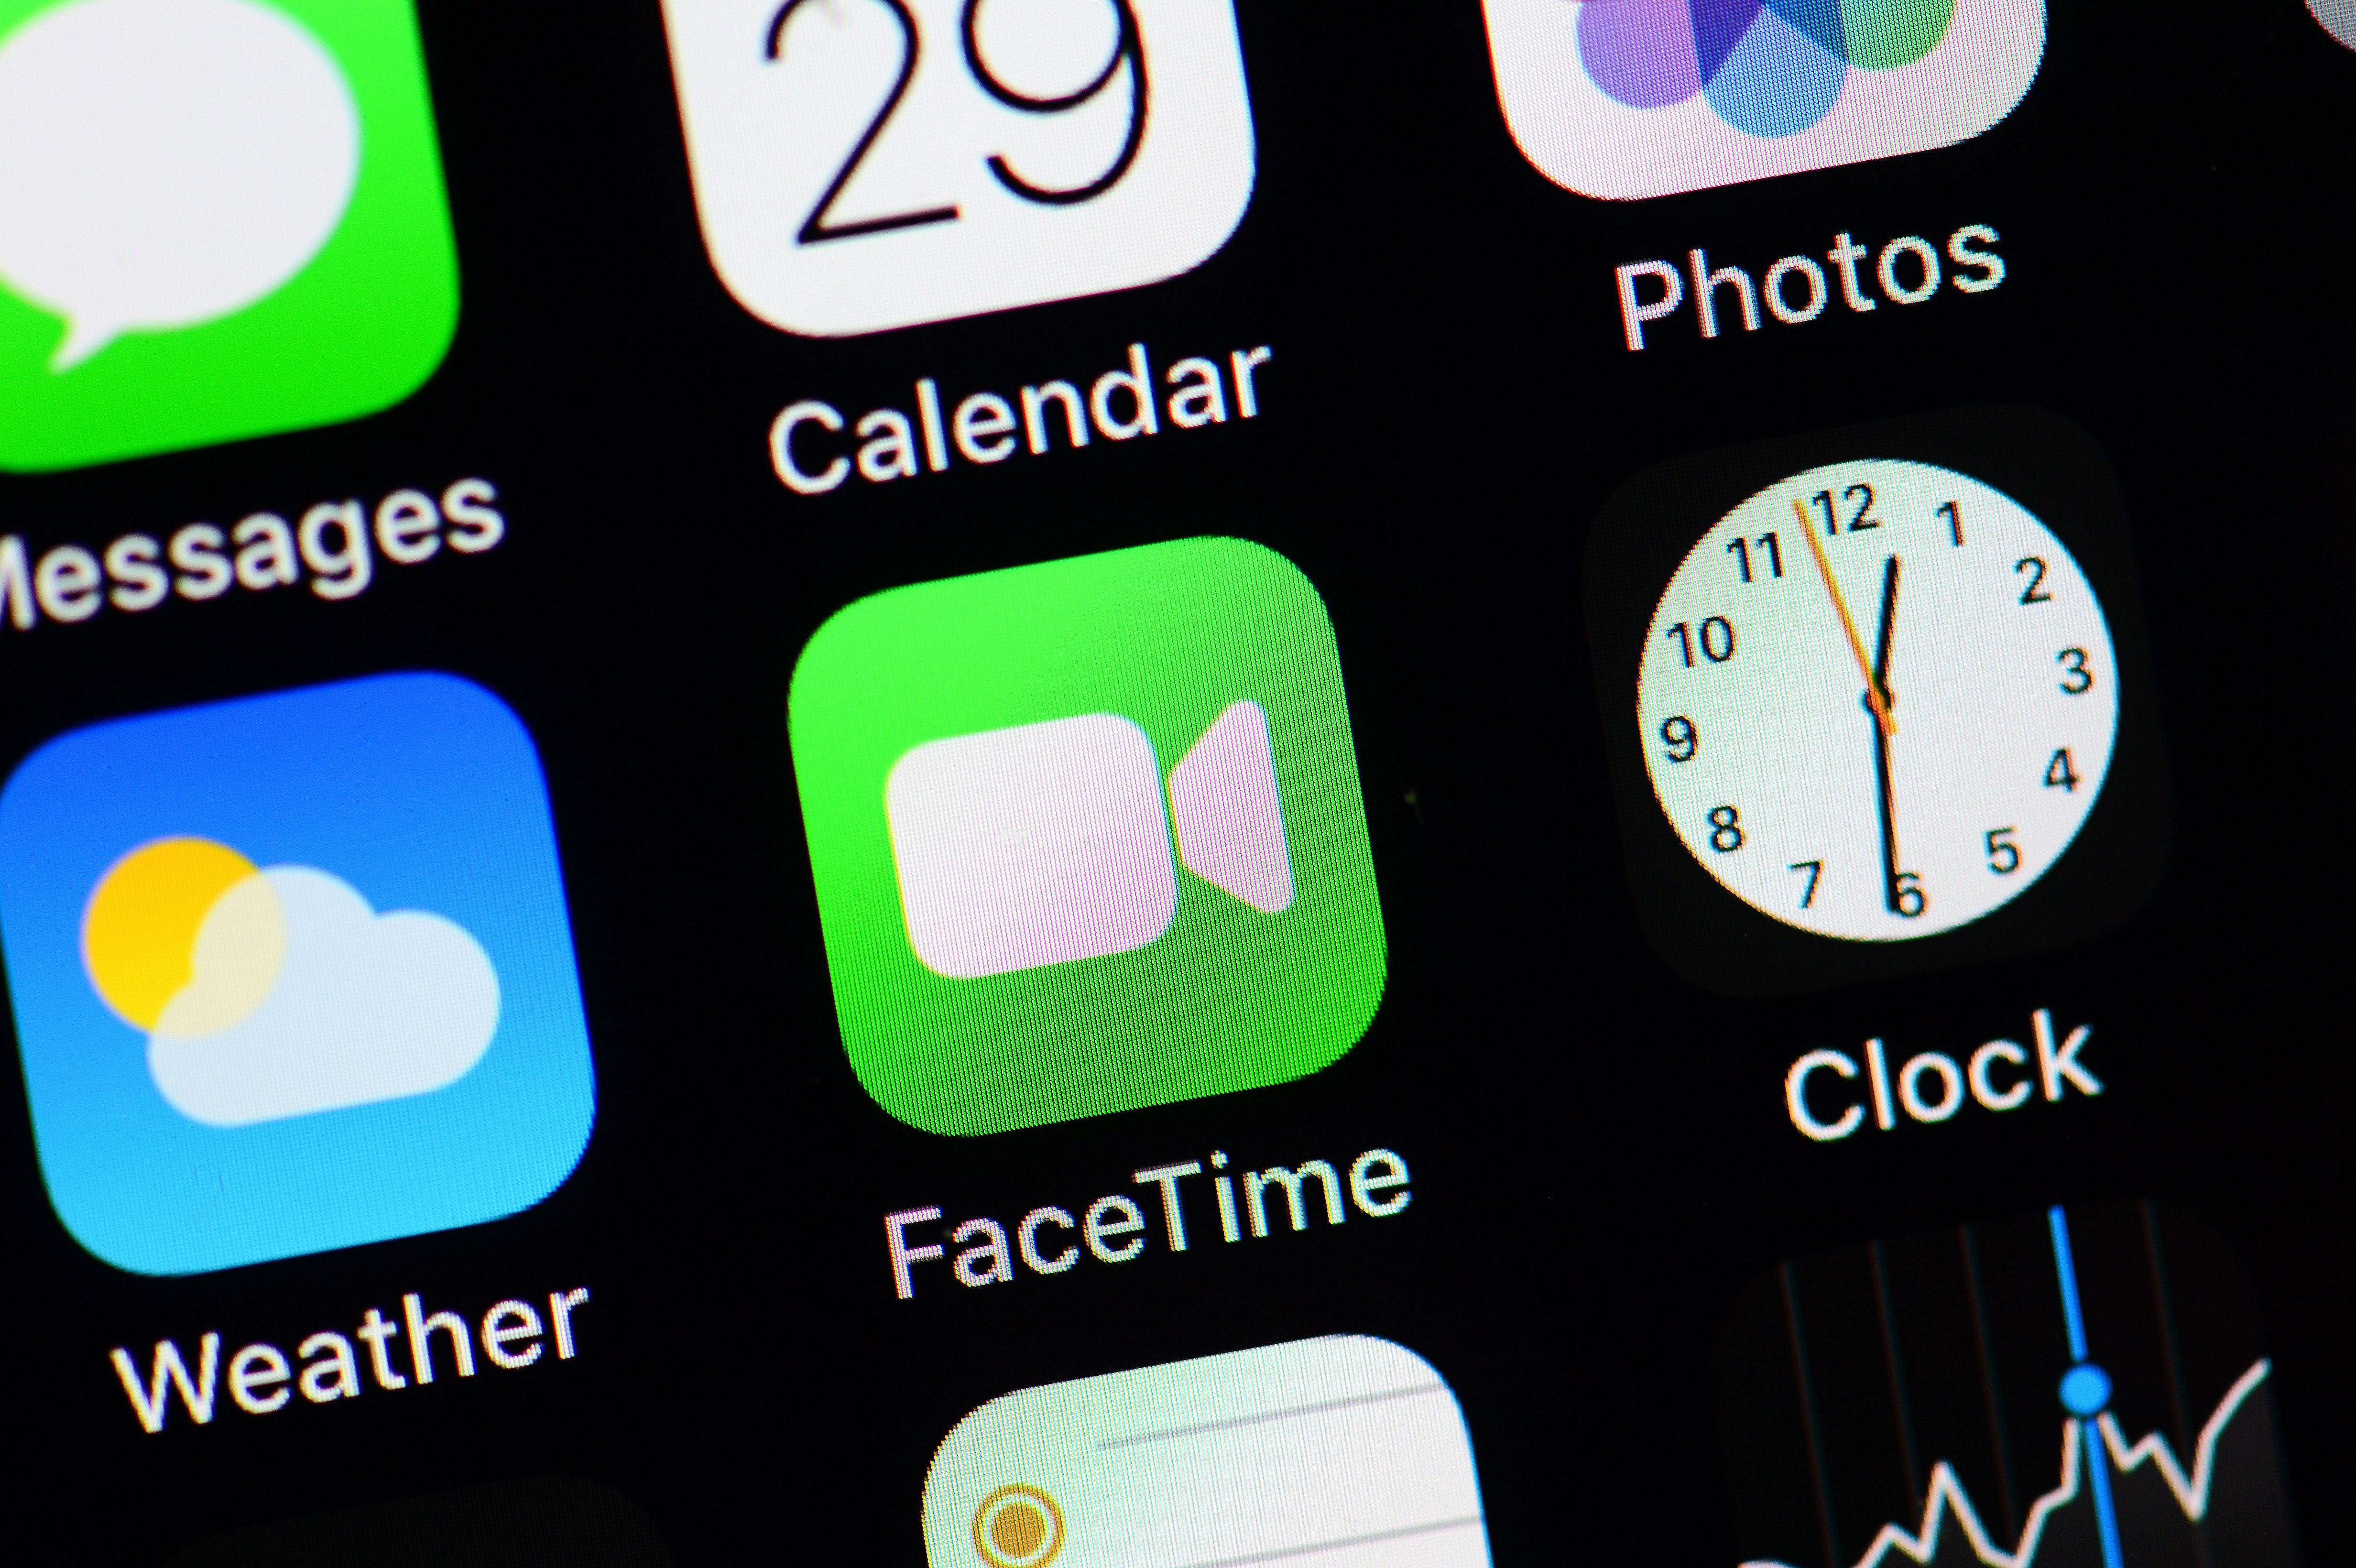 FaceTime advice to ignore Oakland deputy sparks arrest for driver, then caller